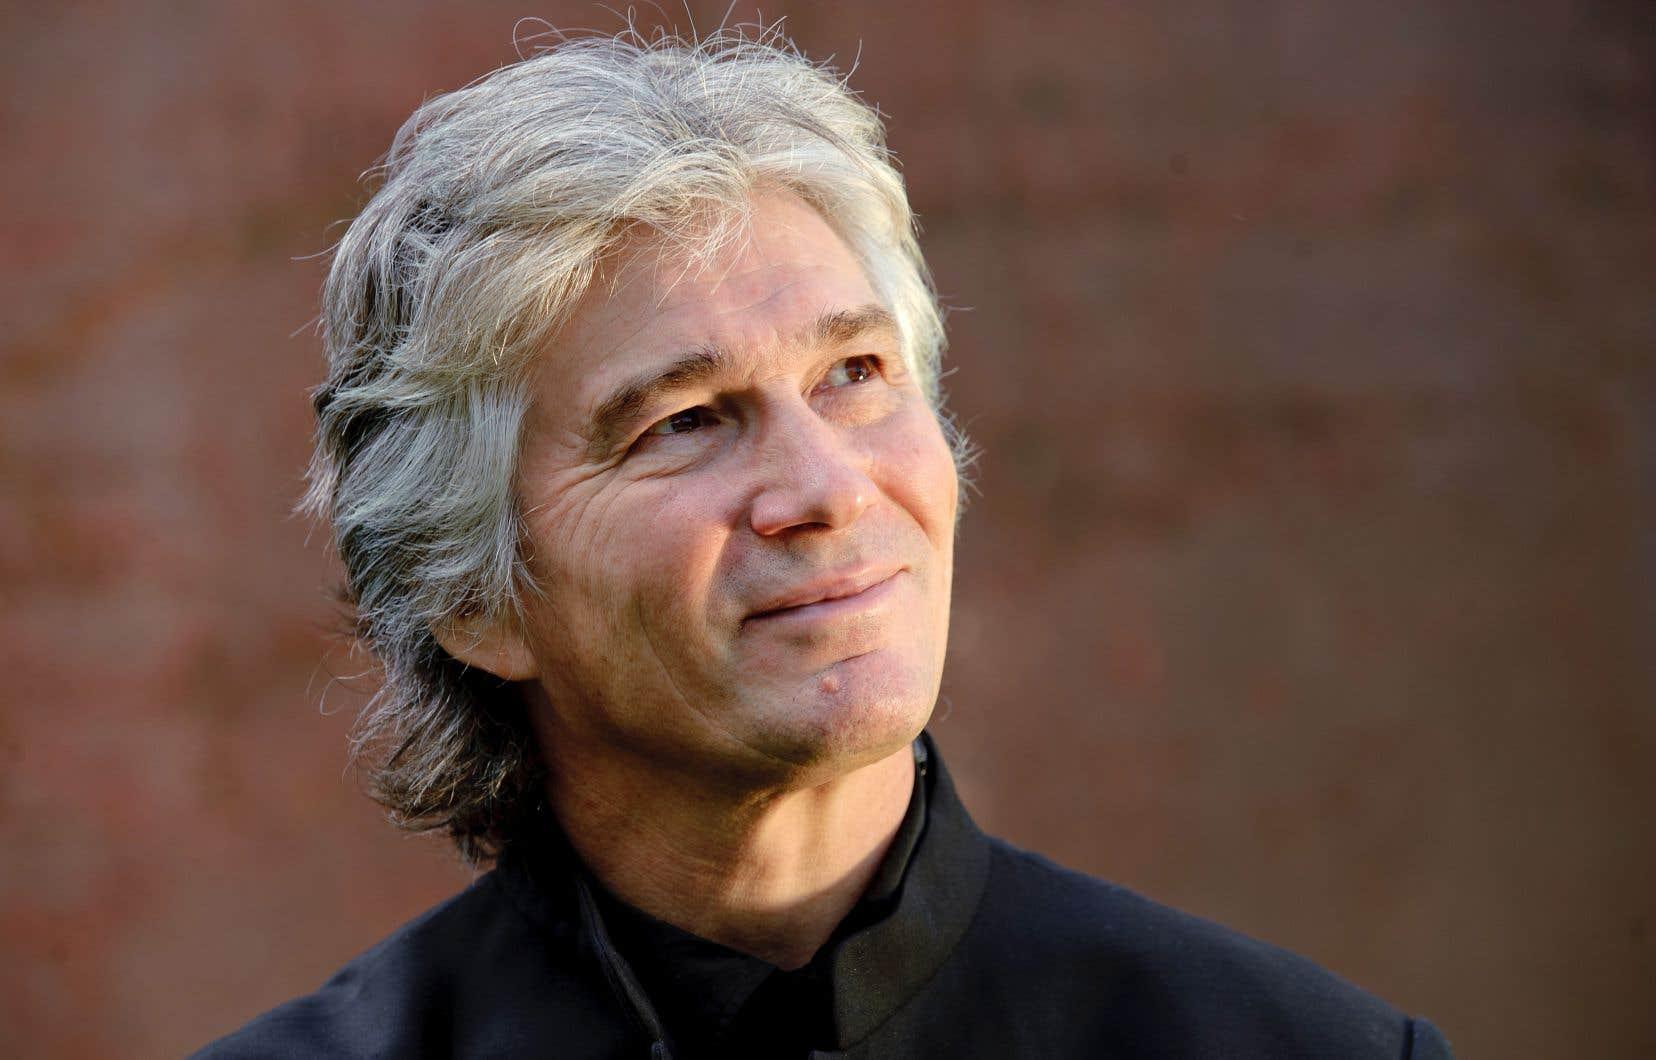 Le chef d'orchestre Jonathan Darlington